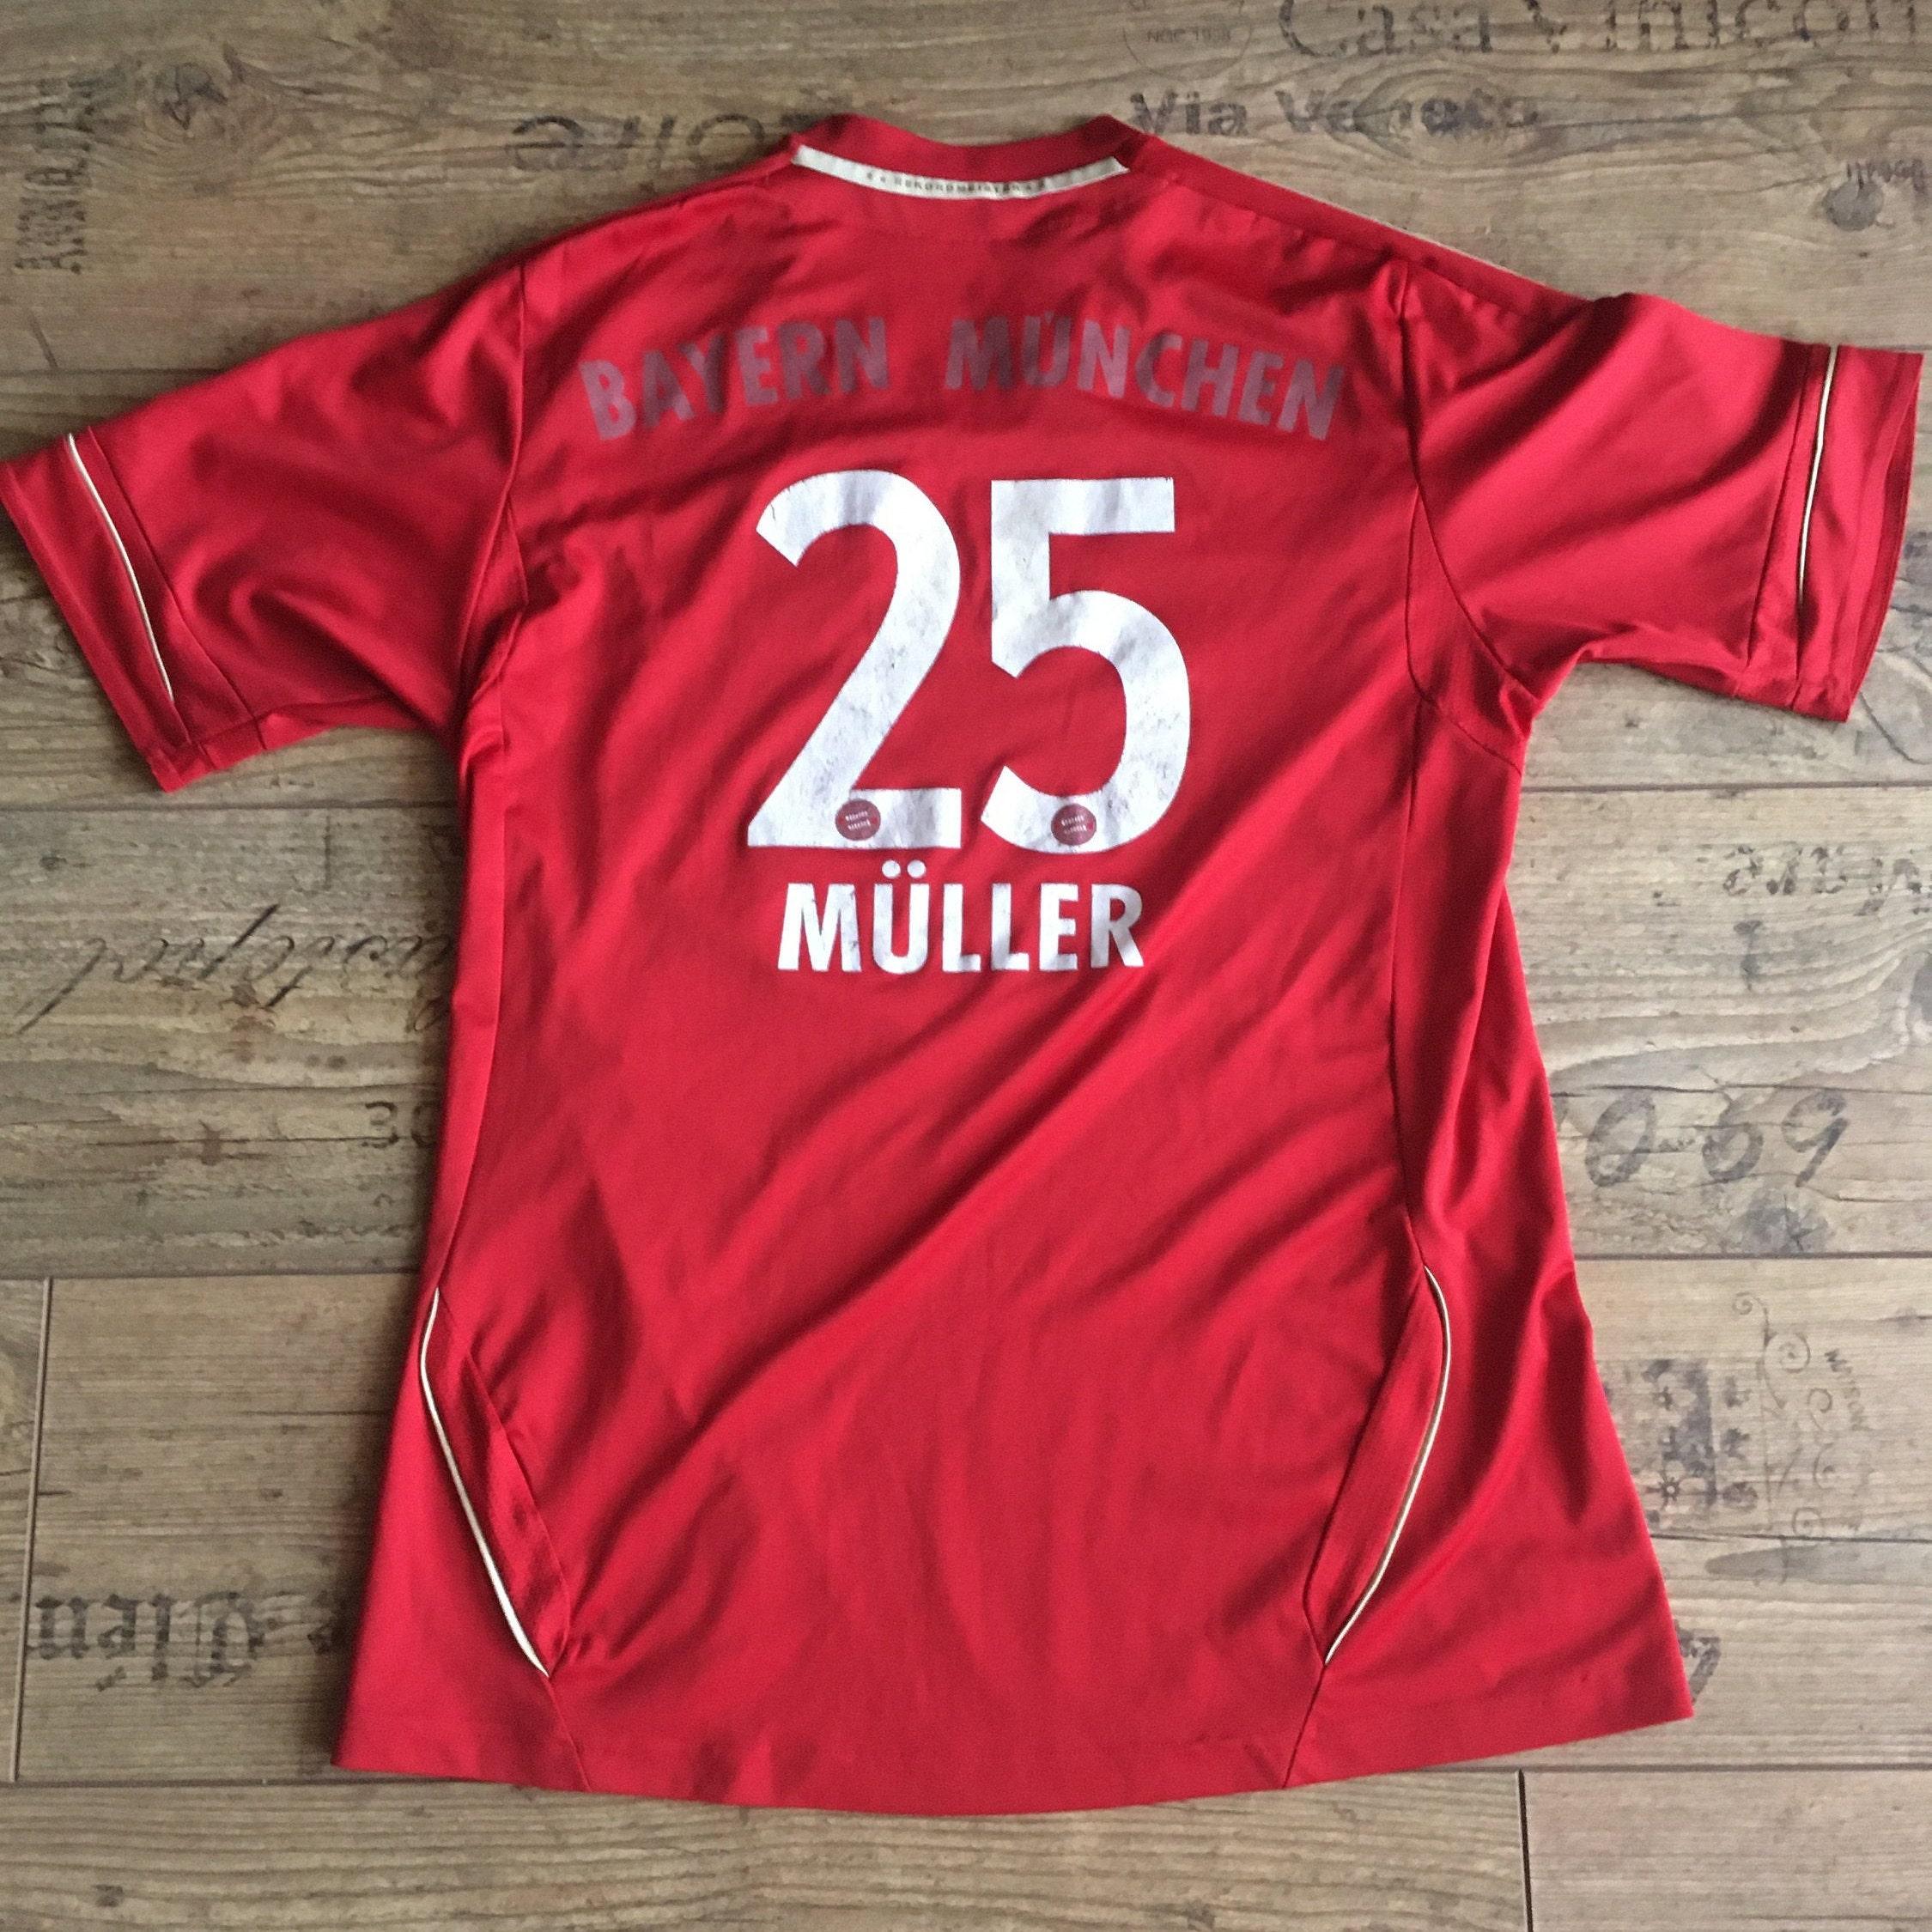 Jersey FC Bayern Munich Thomas Müller #25 Germany Bundesliga 2011/2012 2012/2013 Home Kit Adidas S Vintage Rare